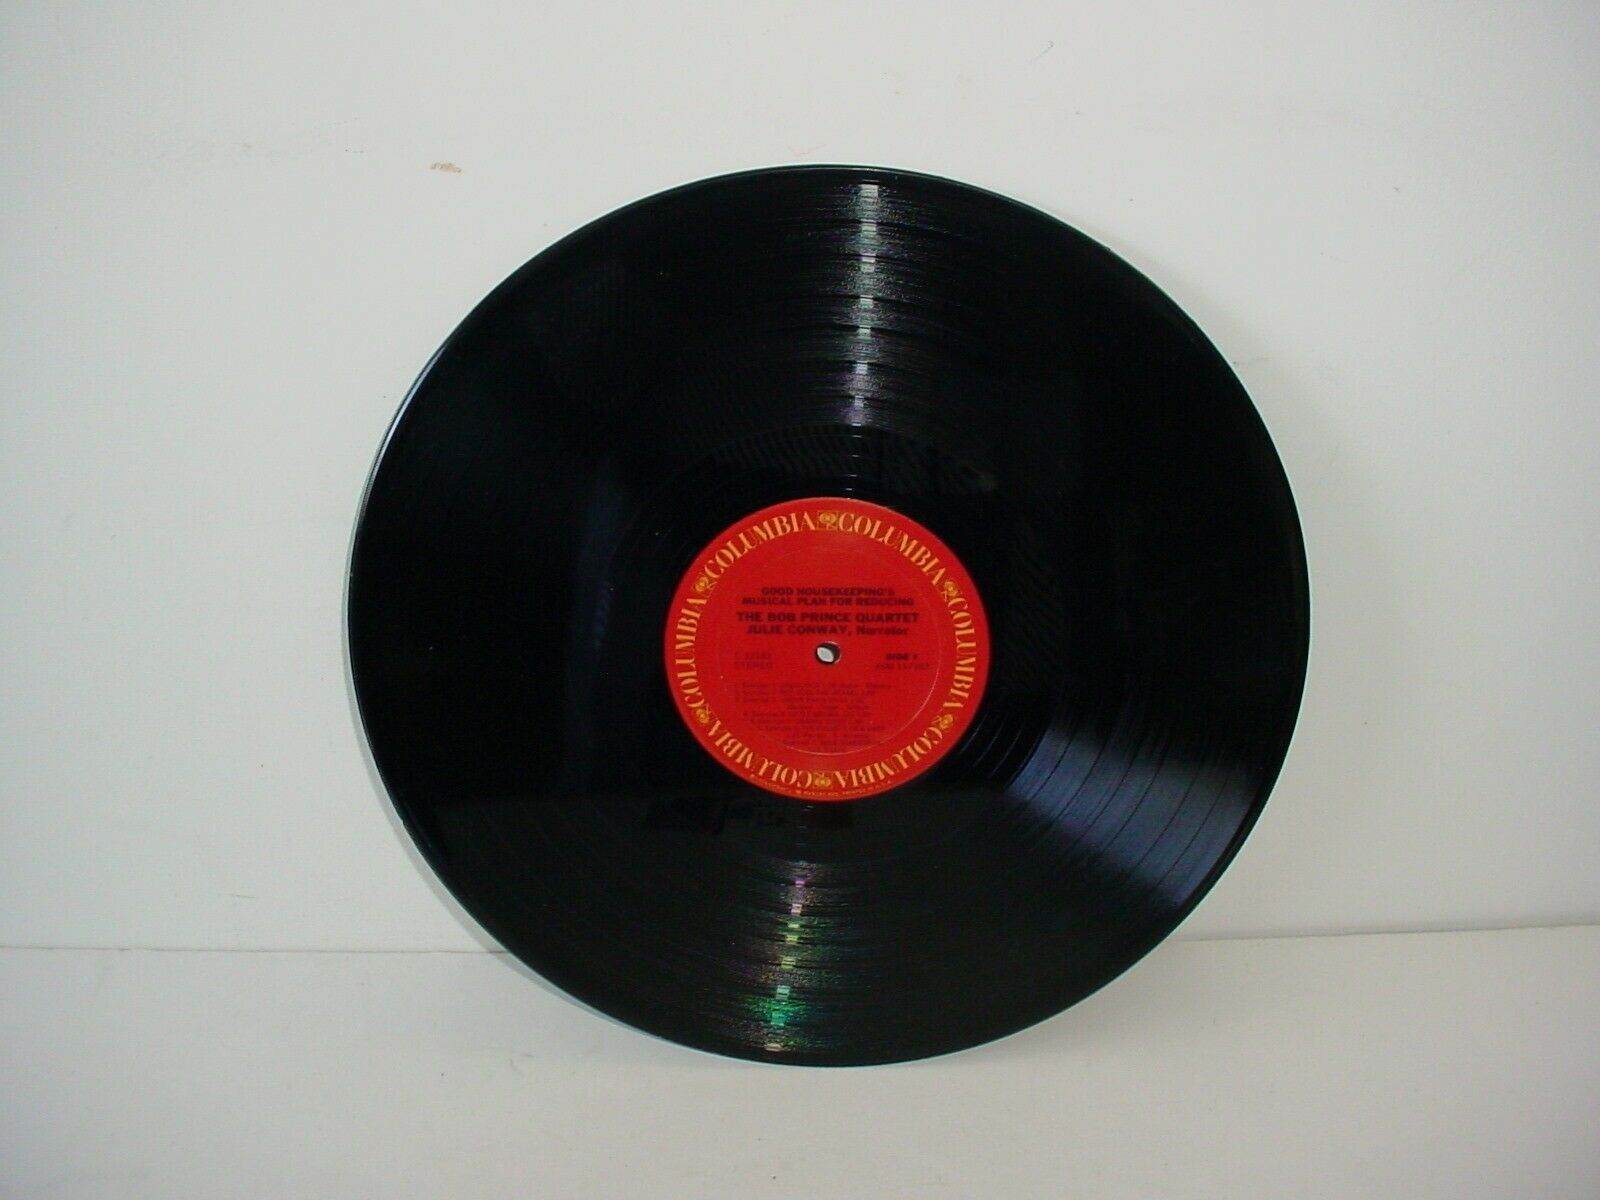 Good Housekeeping Musical Plan for Reducing Bob Prince Lp Album Vinyl Record 33